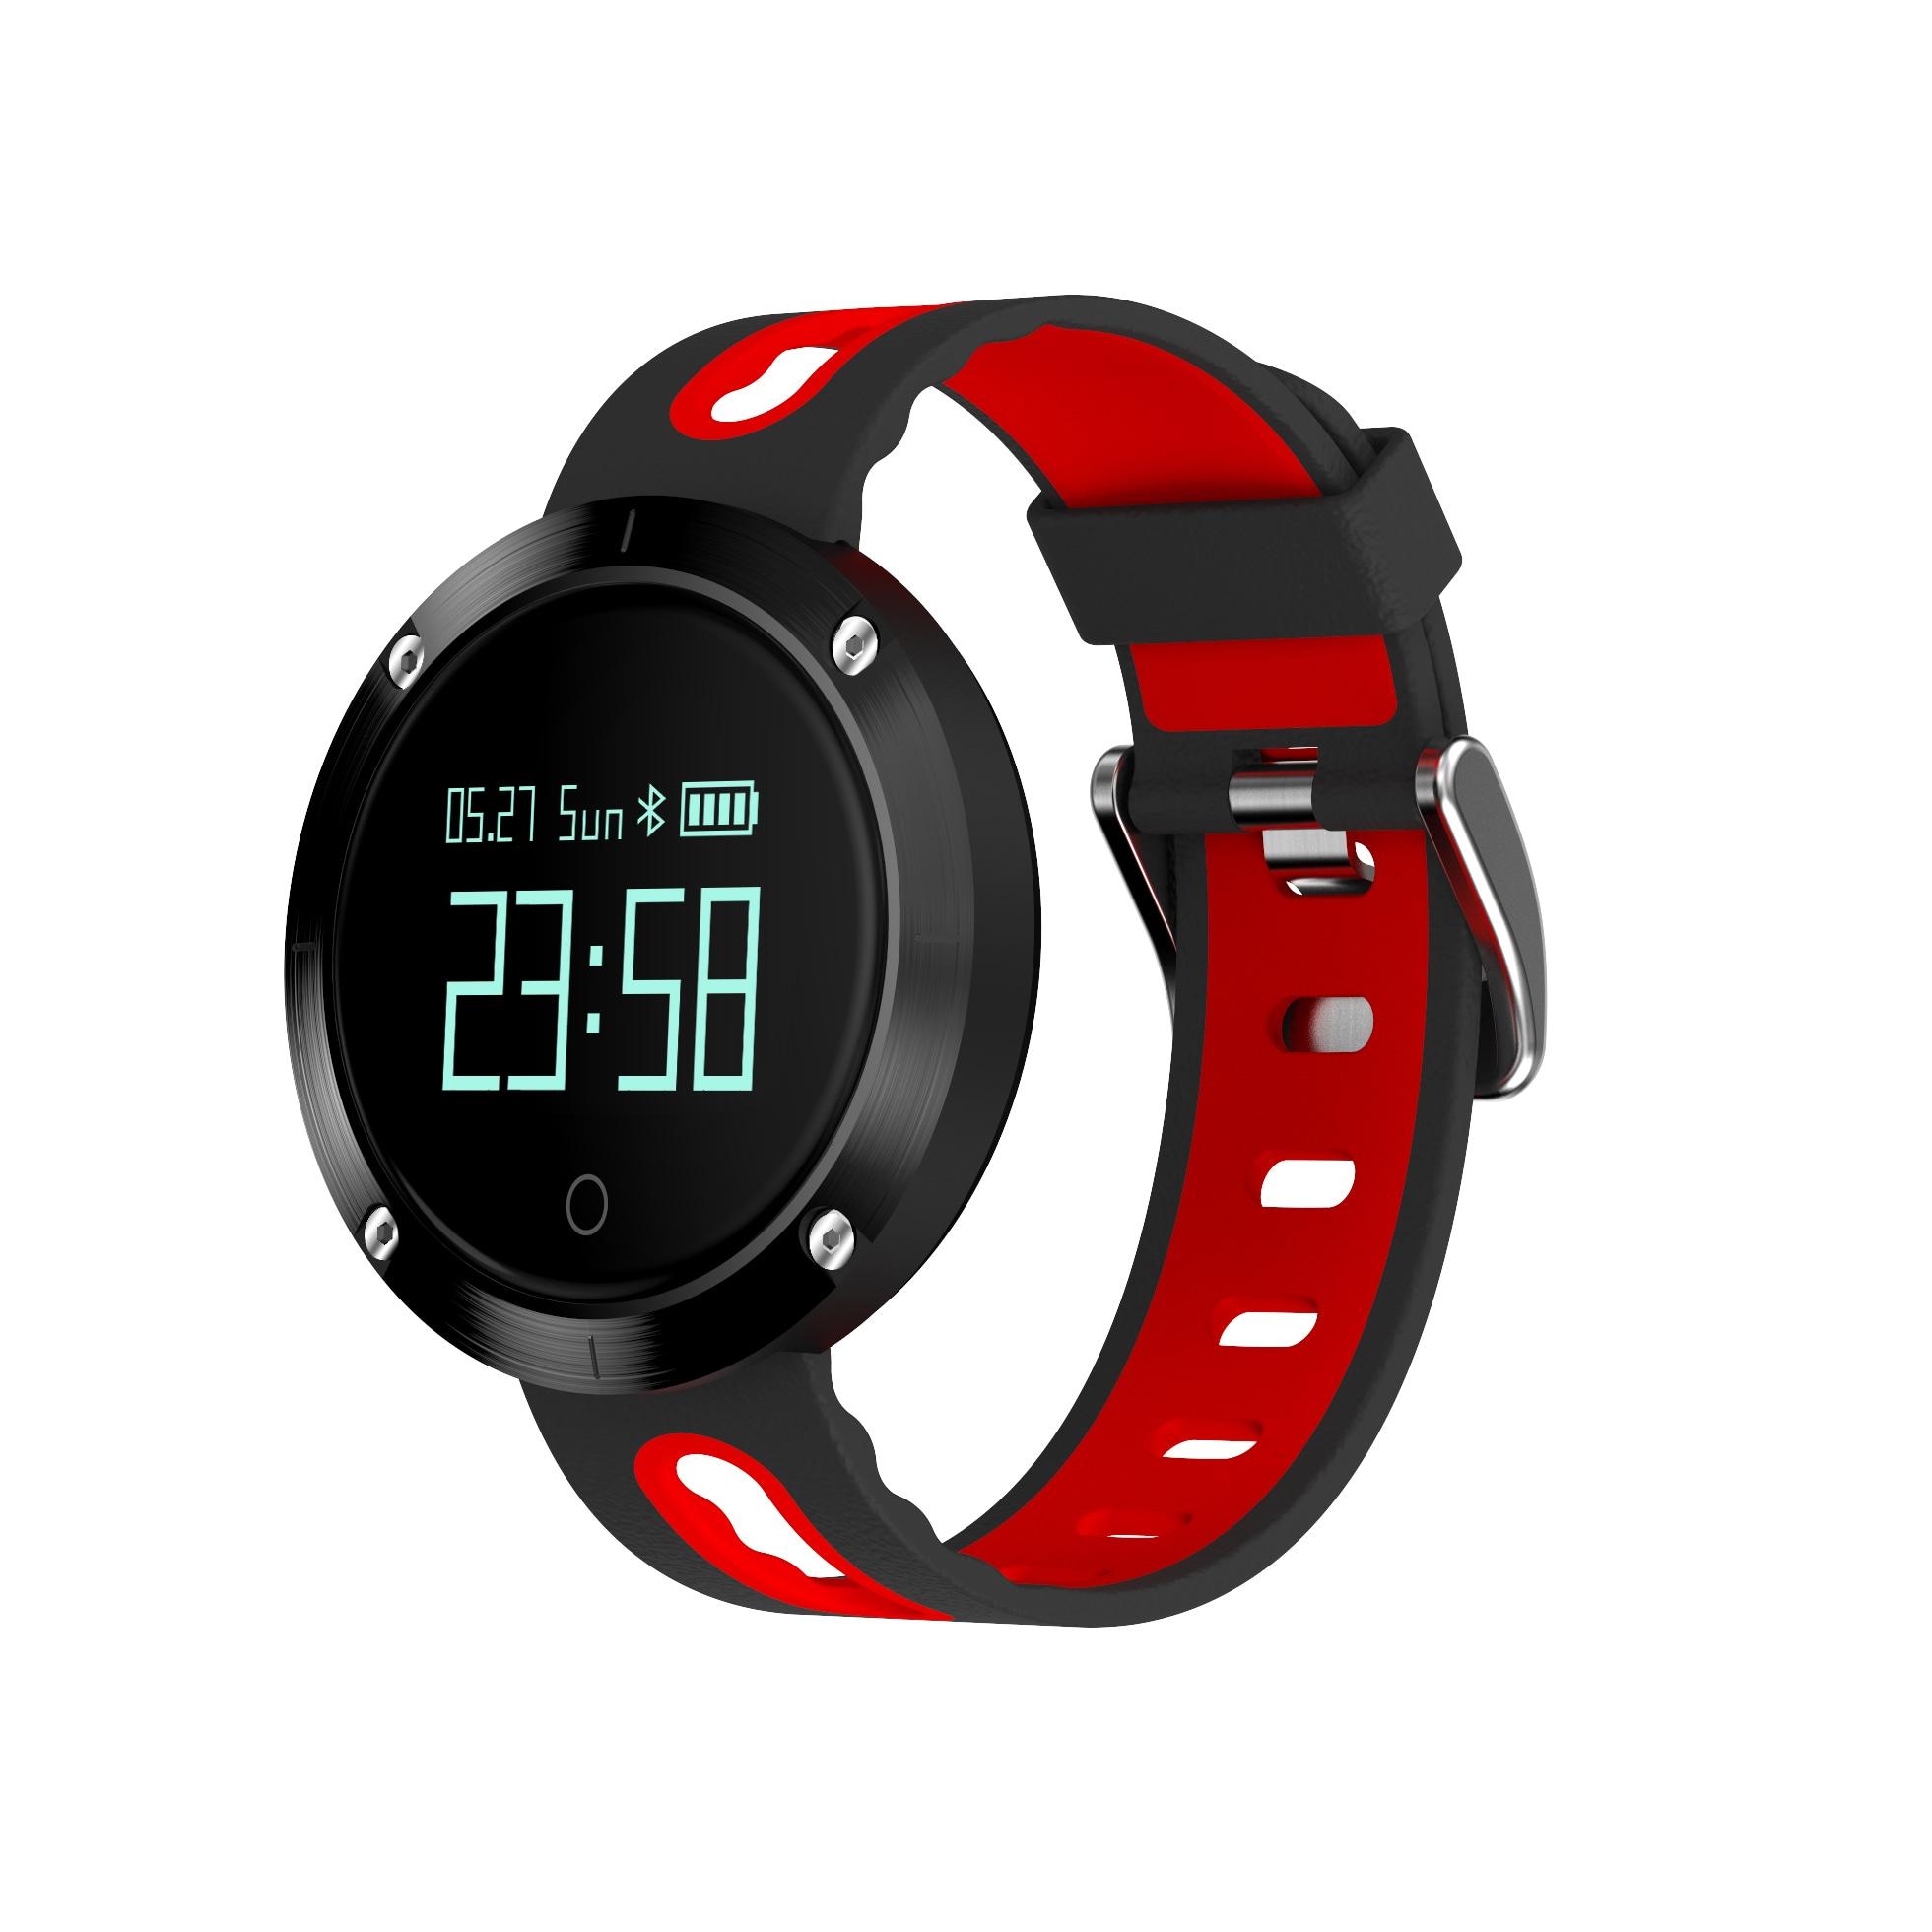 DOMINO DM58 0.95 Inch Round Display Screen Smart Bracelet Heart Rate Monitor Sport Wristband Fitness Tracker Black - 6